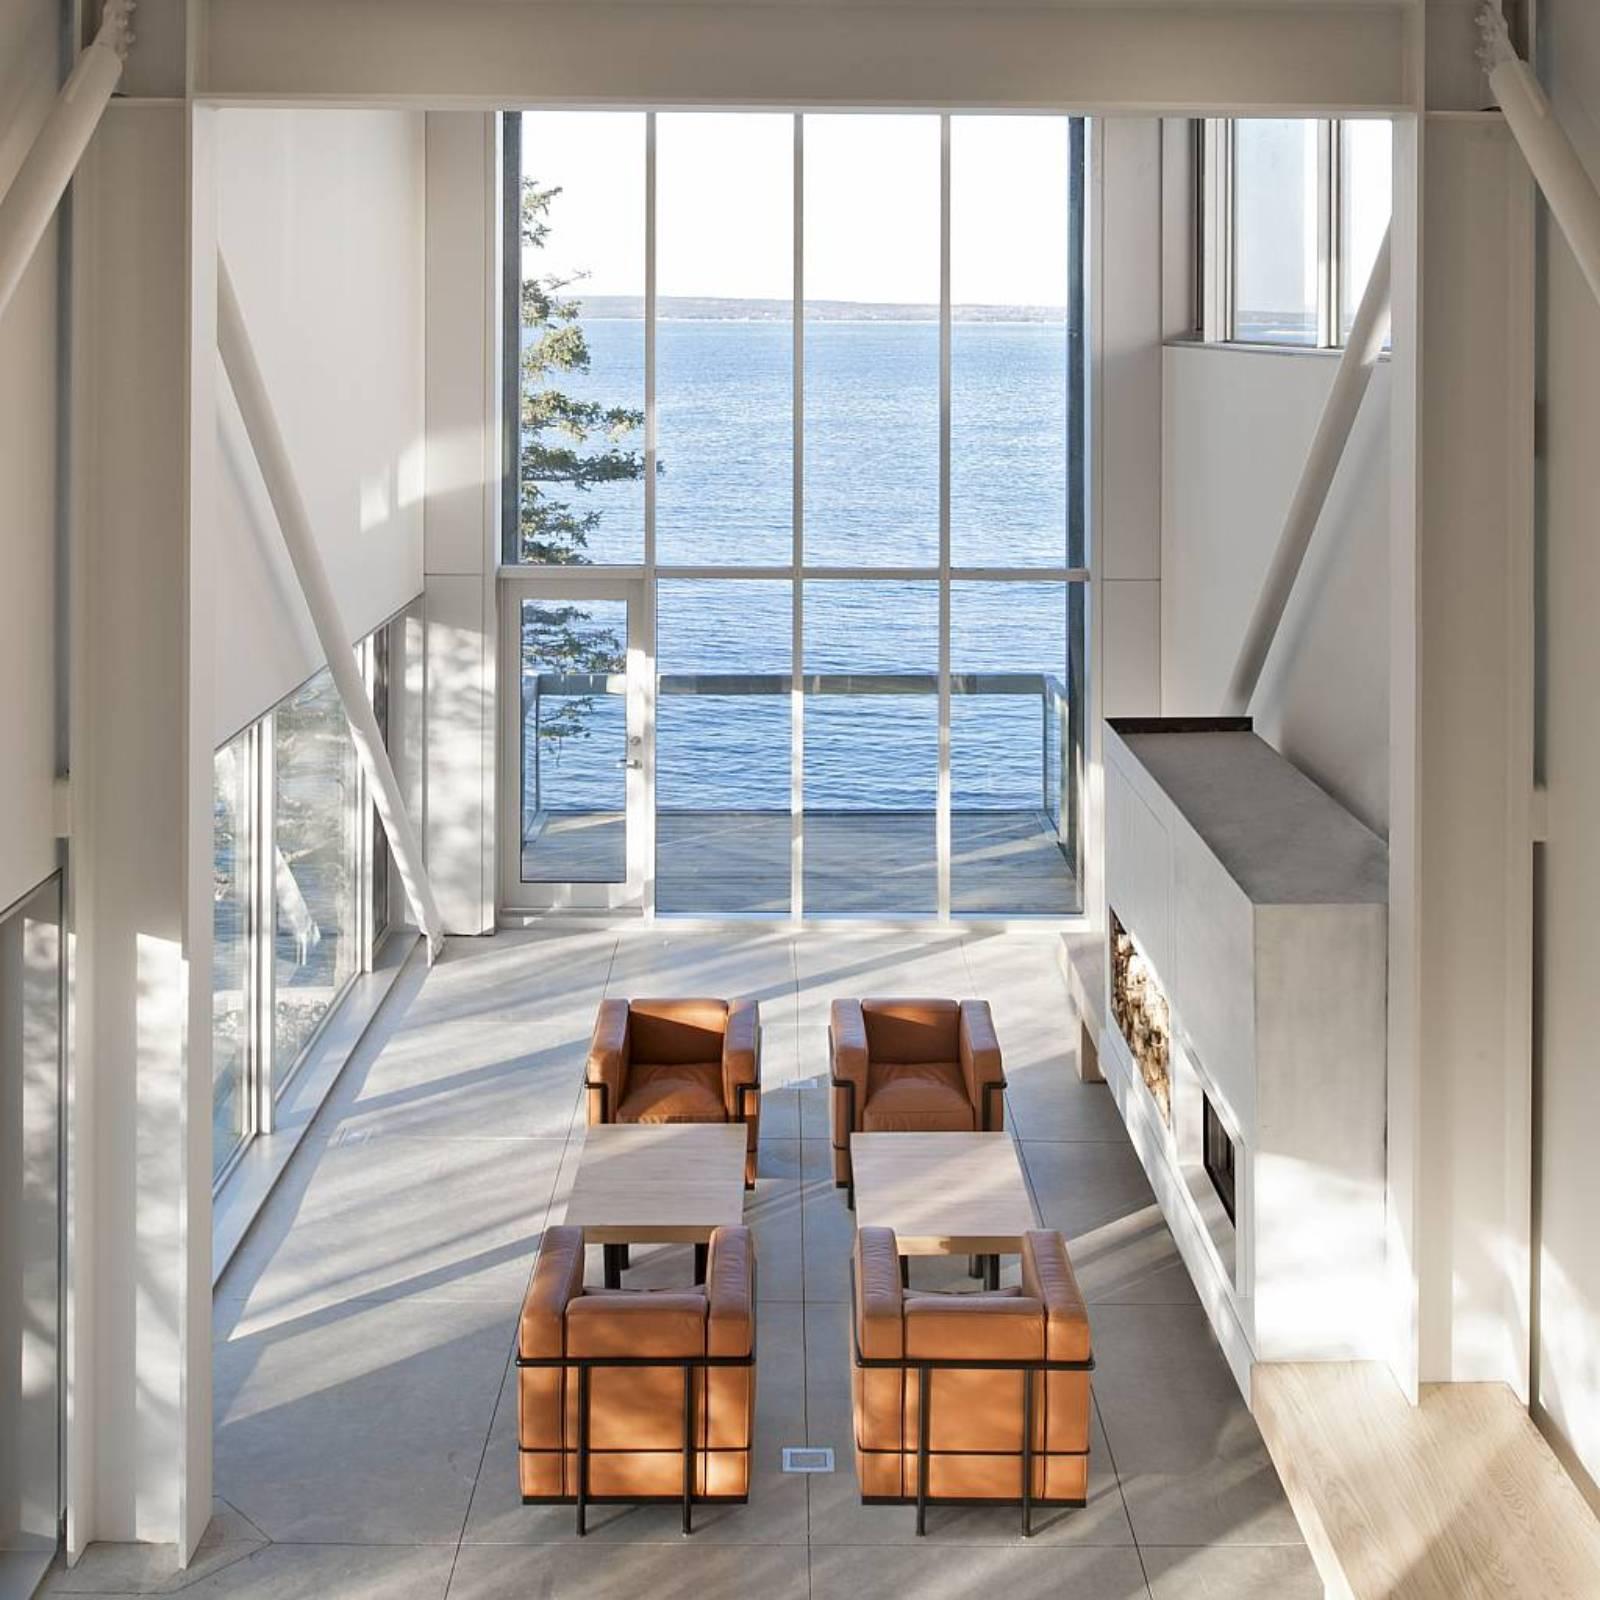 Glass Wall, Living Room, Home in Port Mouton, Nova Scotia